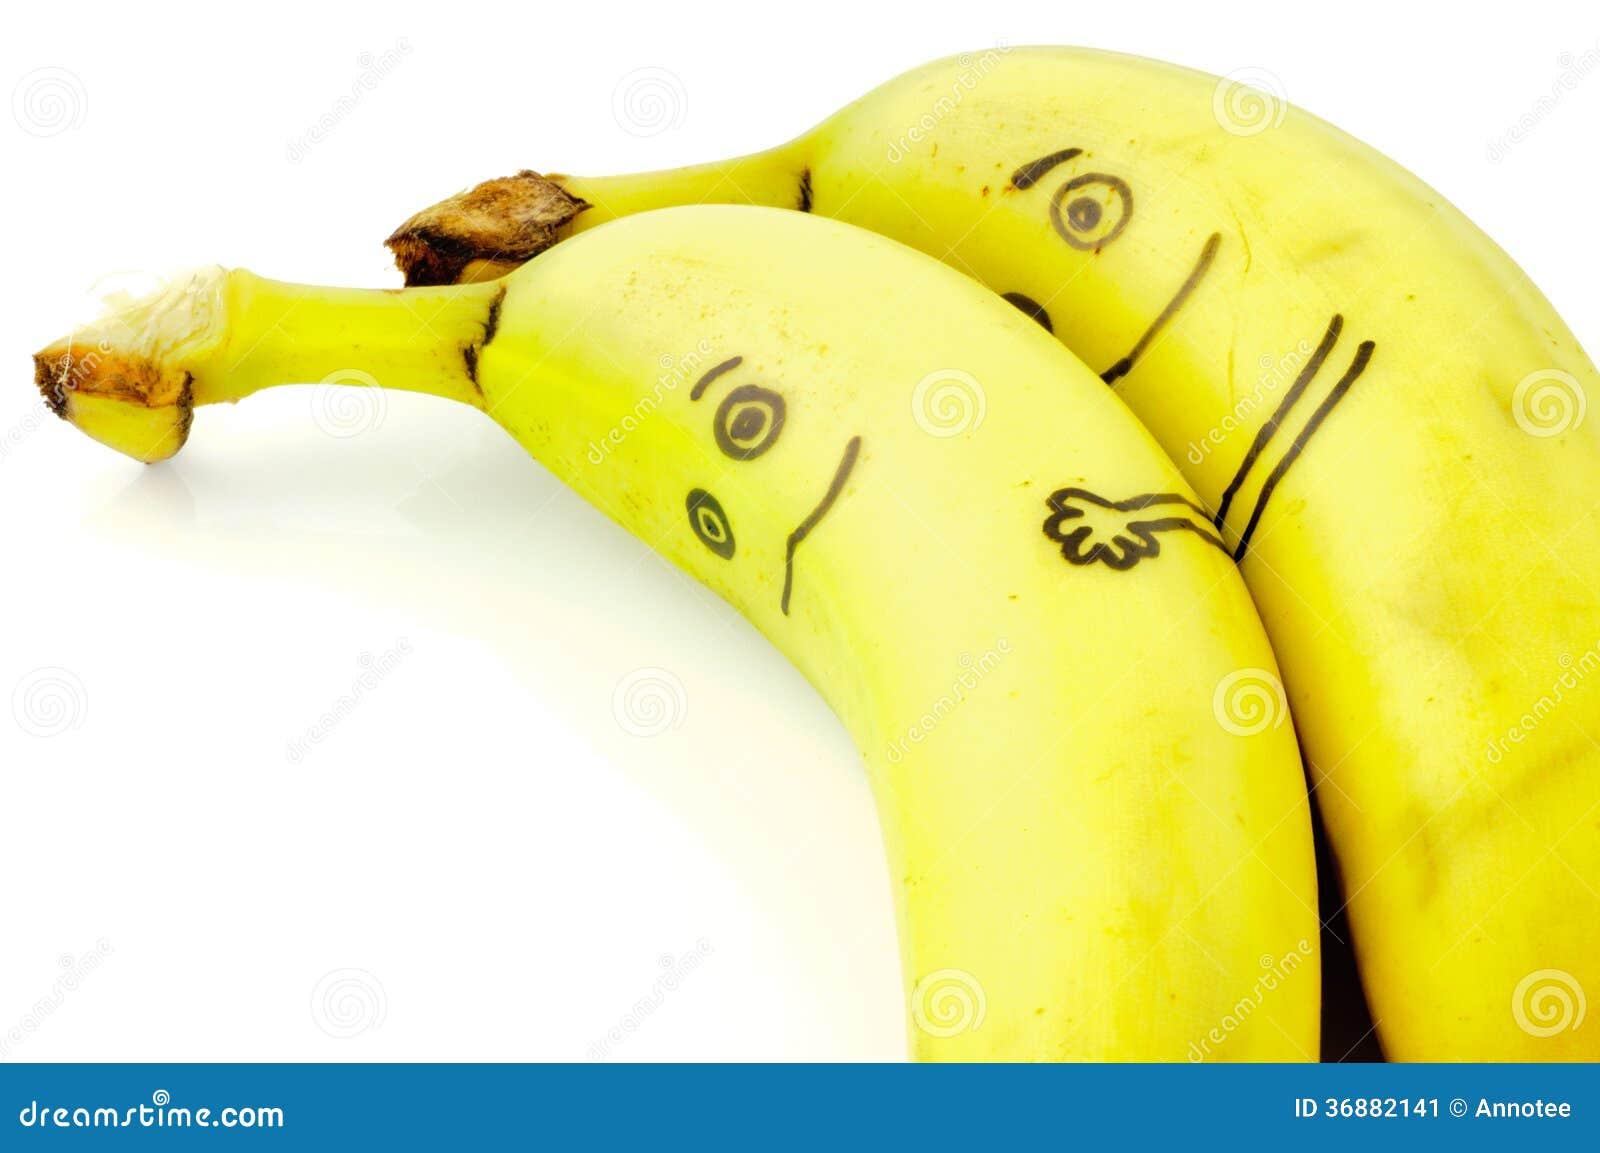 Amour de banane